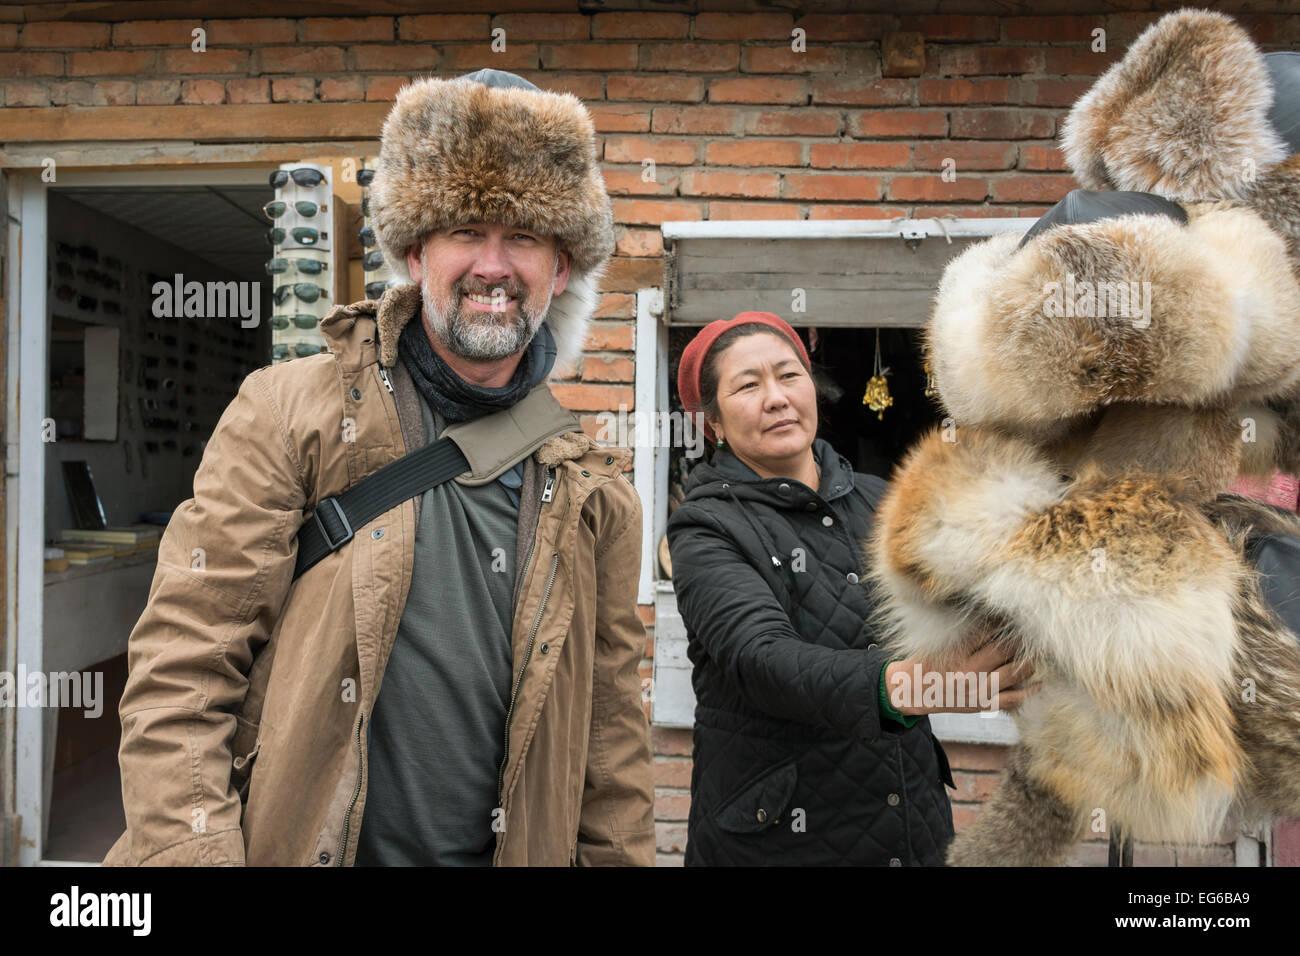 515a8d6bb52 Fur Hat Stock Photos   Fur Hat Stock Images - Alamy